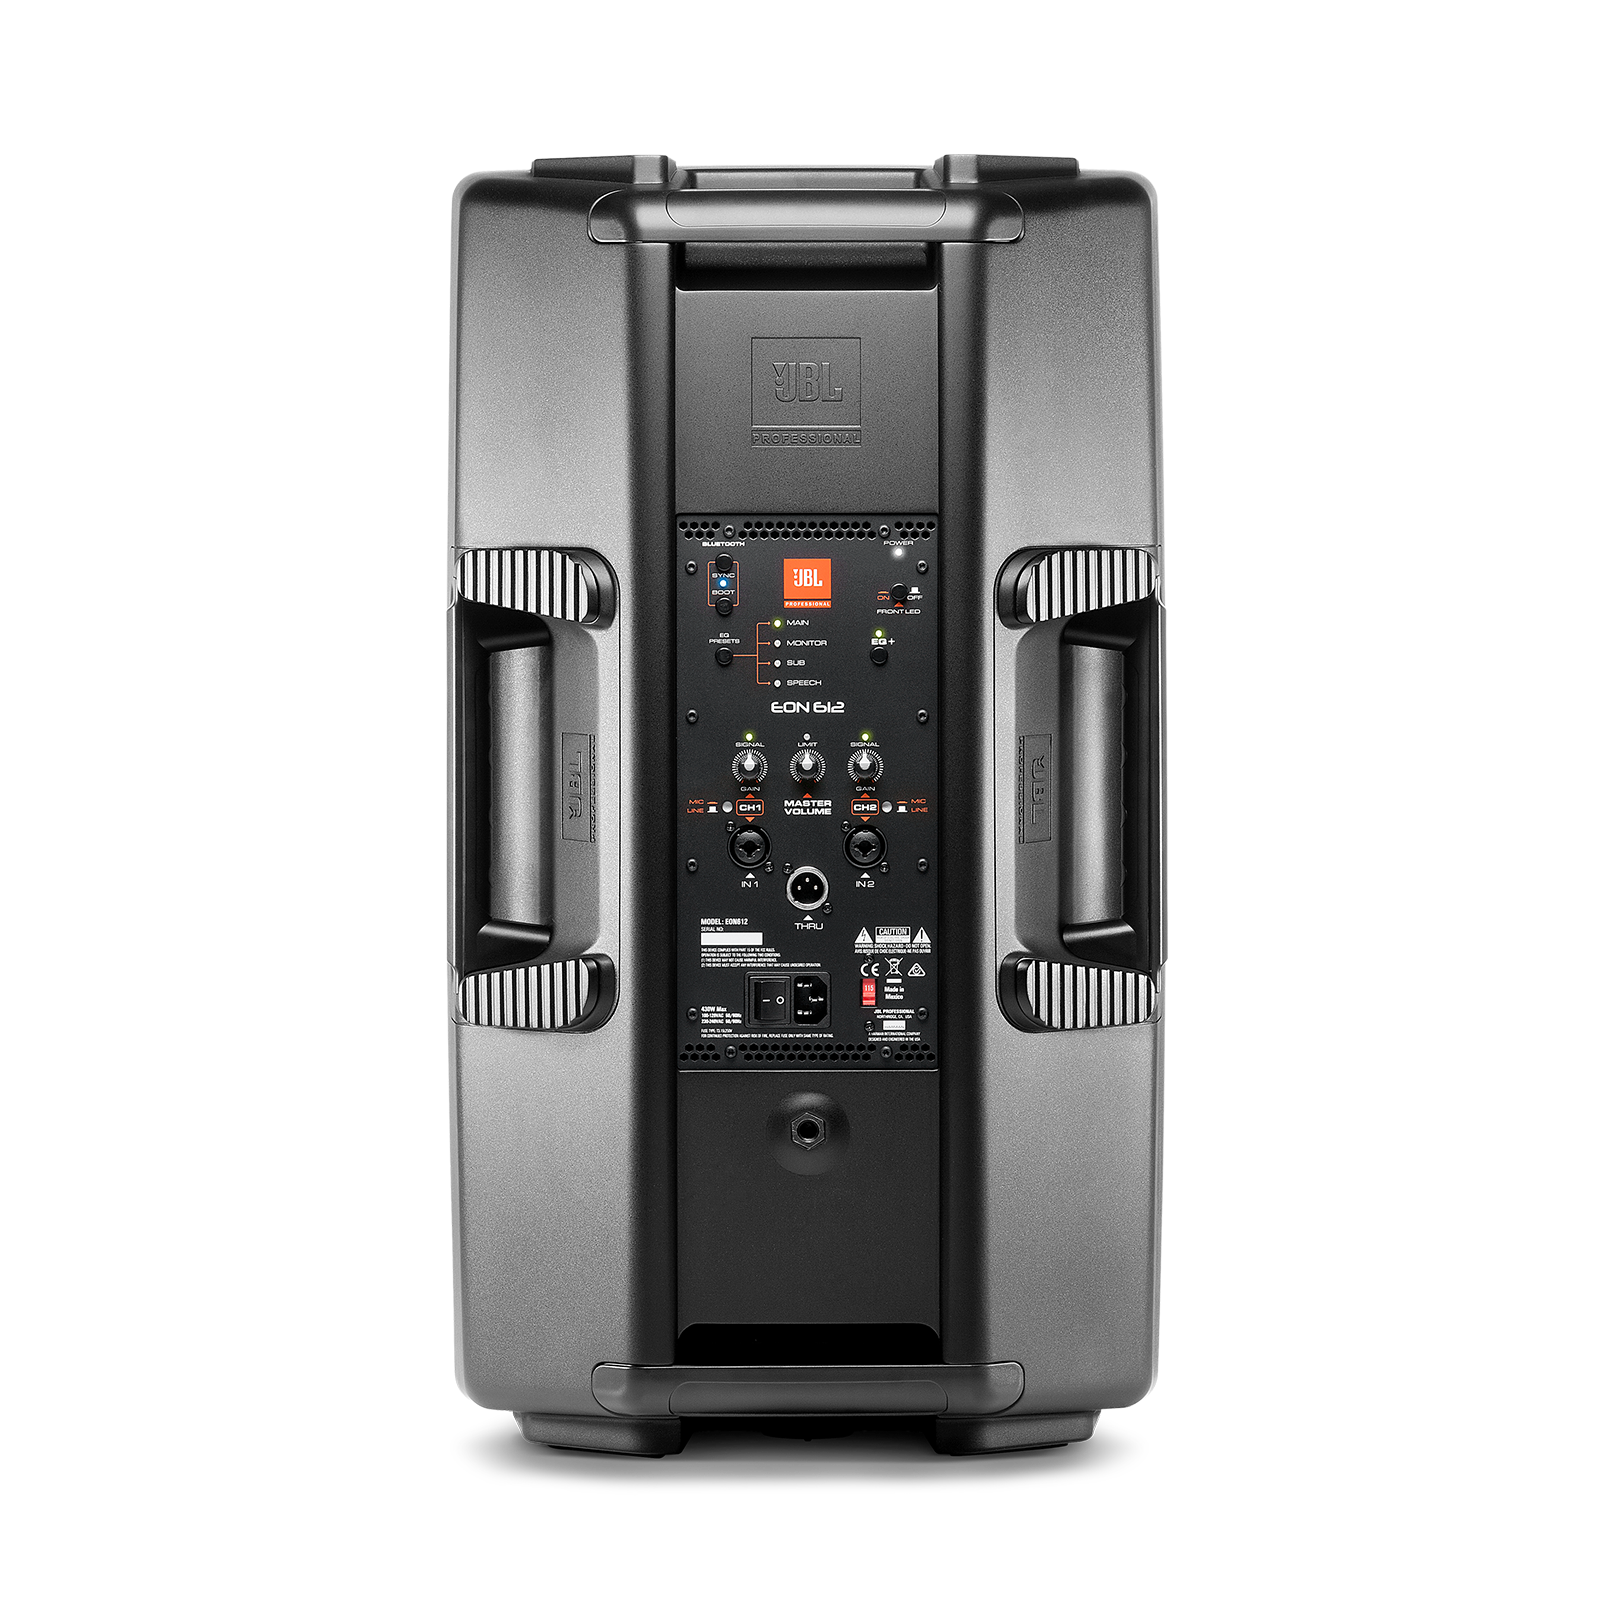 "JBL EON612 - Black - 12"" Two-Way Multipurpose Self-Powered Sound Reinforcement - Back"